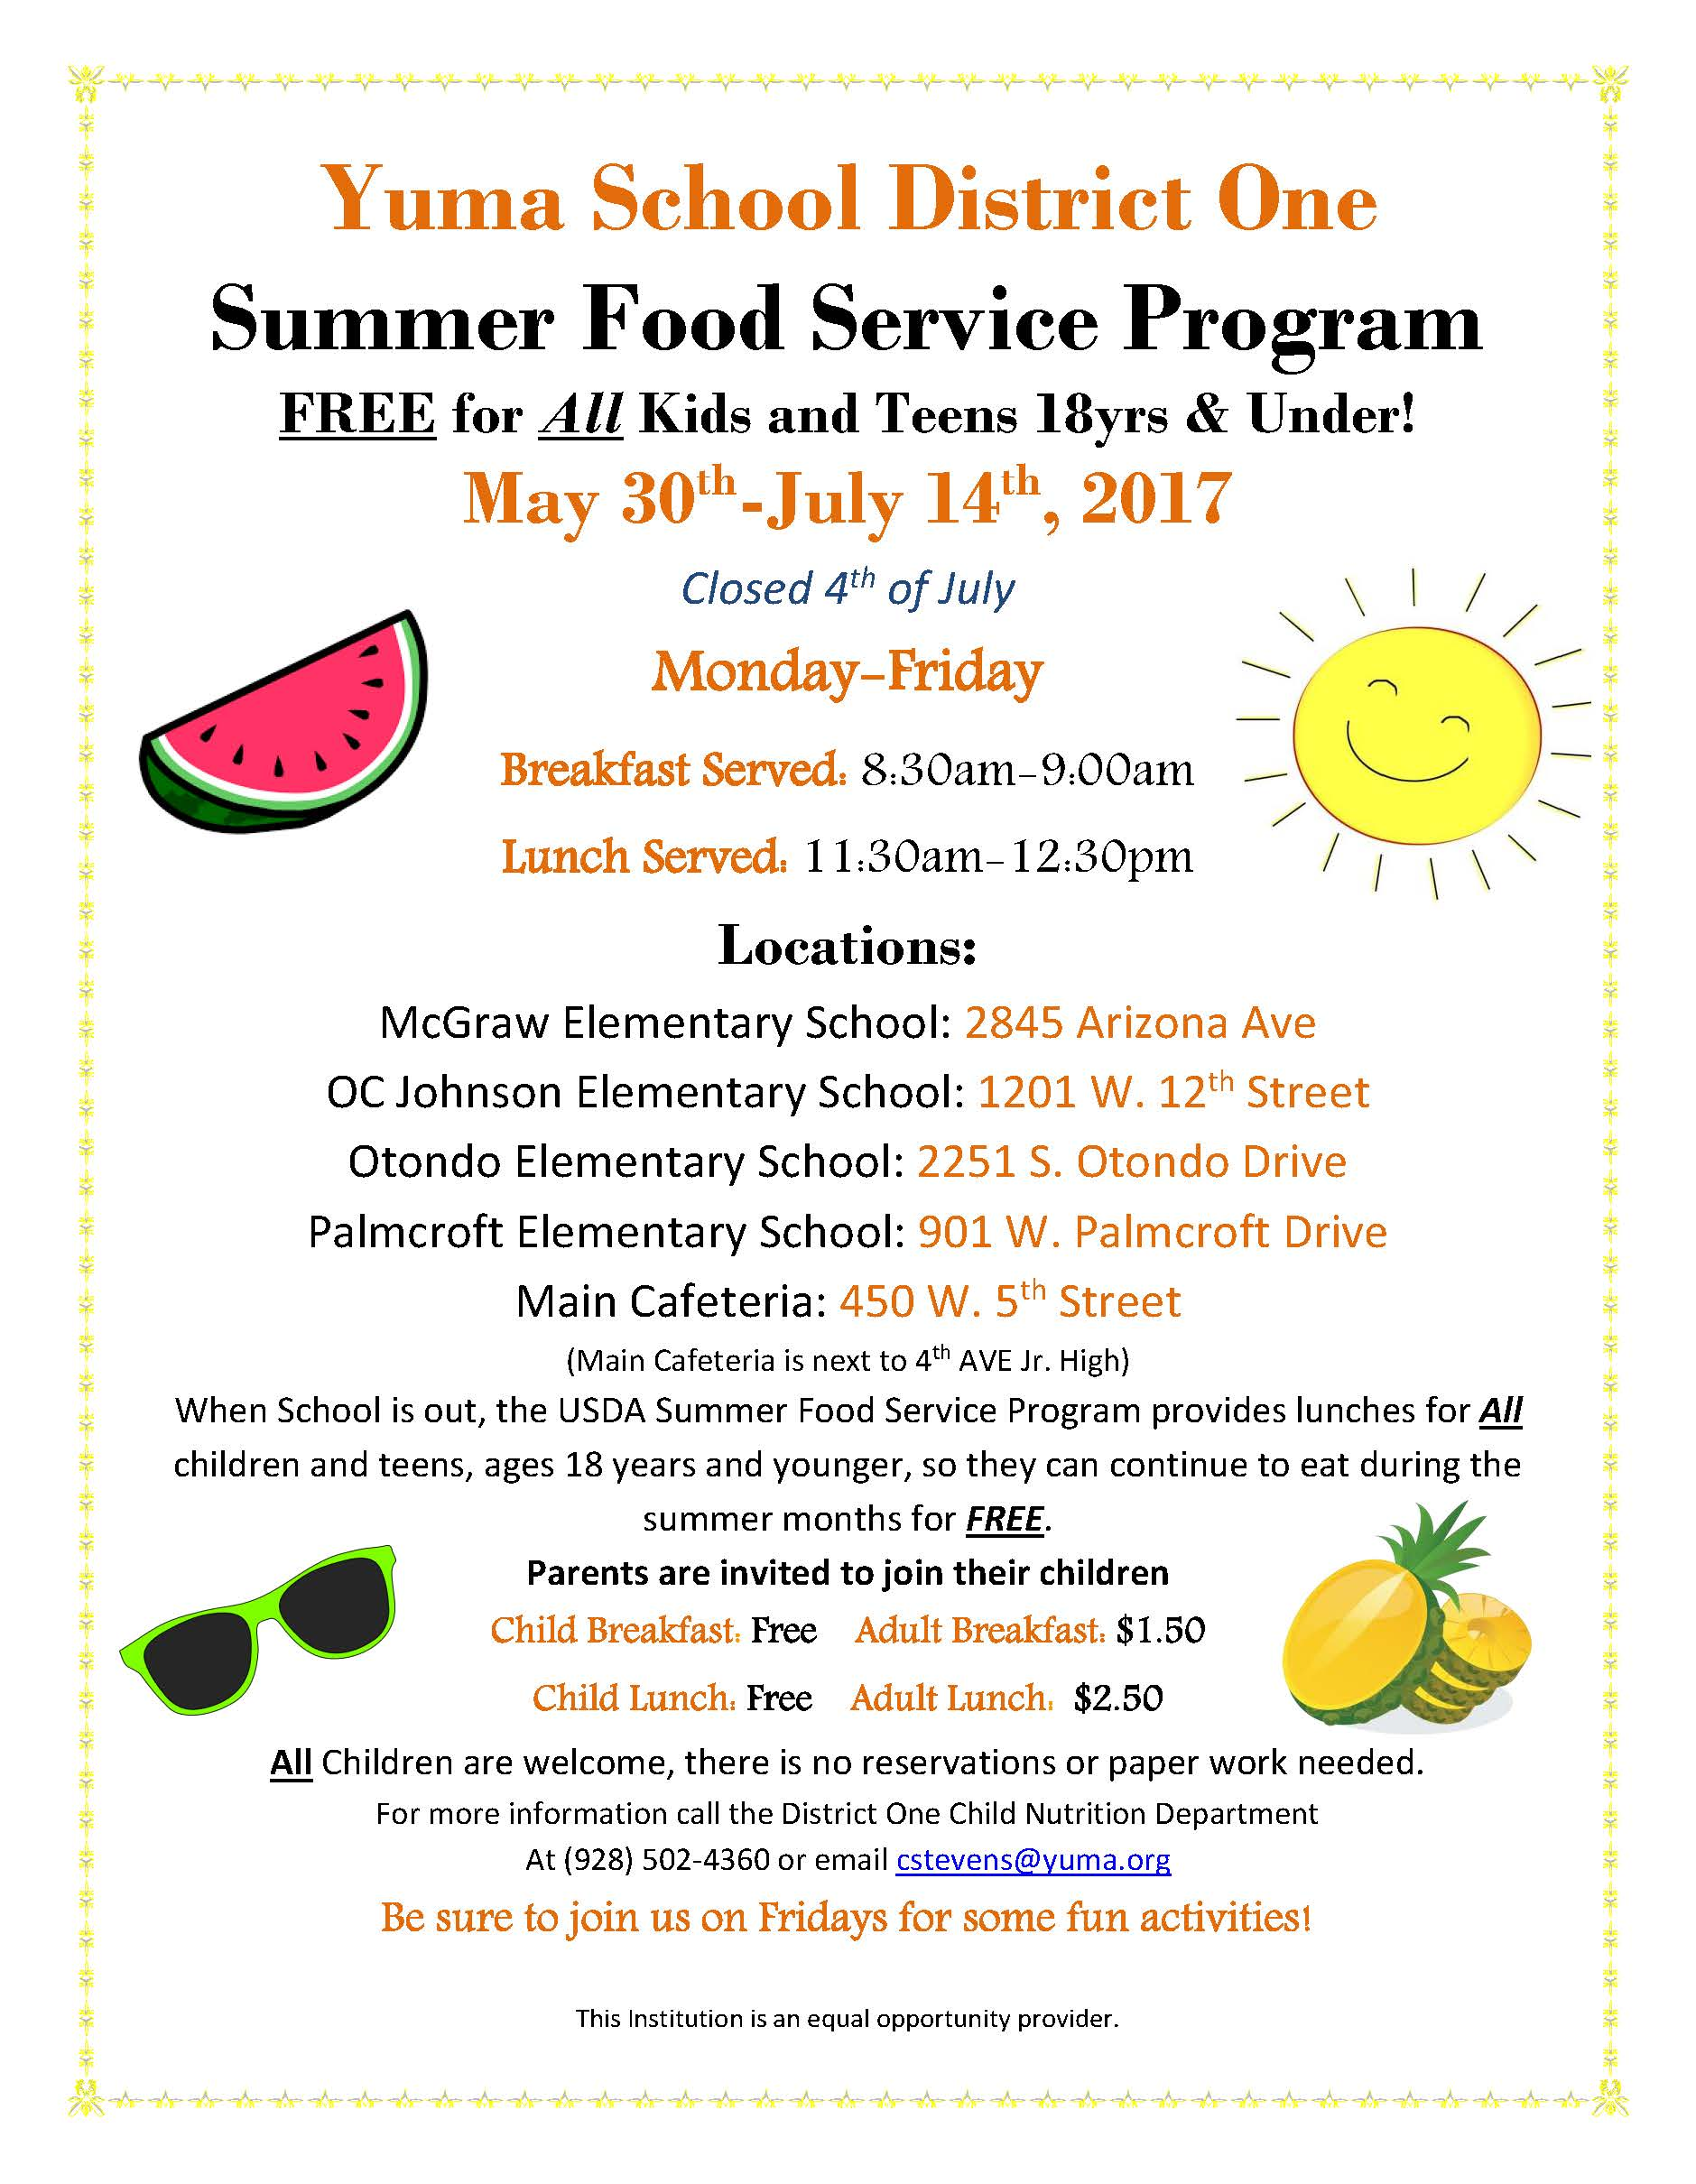 Summer_Food_Program_Flyer2017-jpeg.jpg